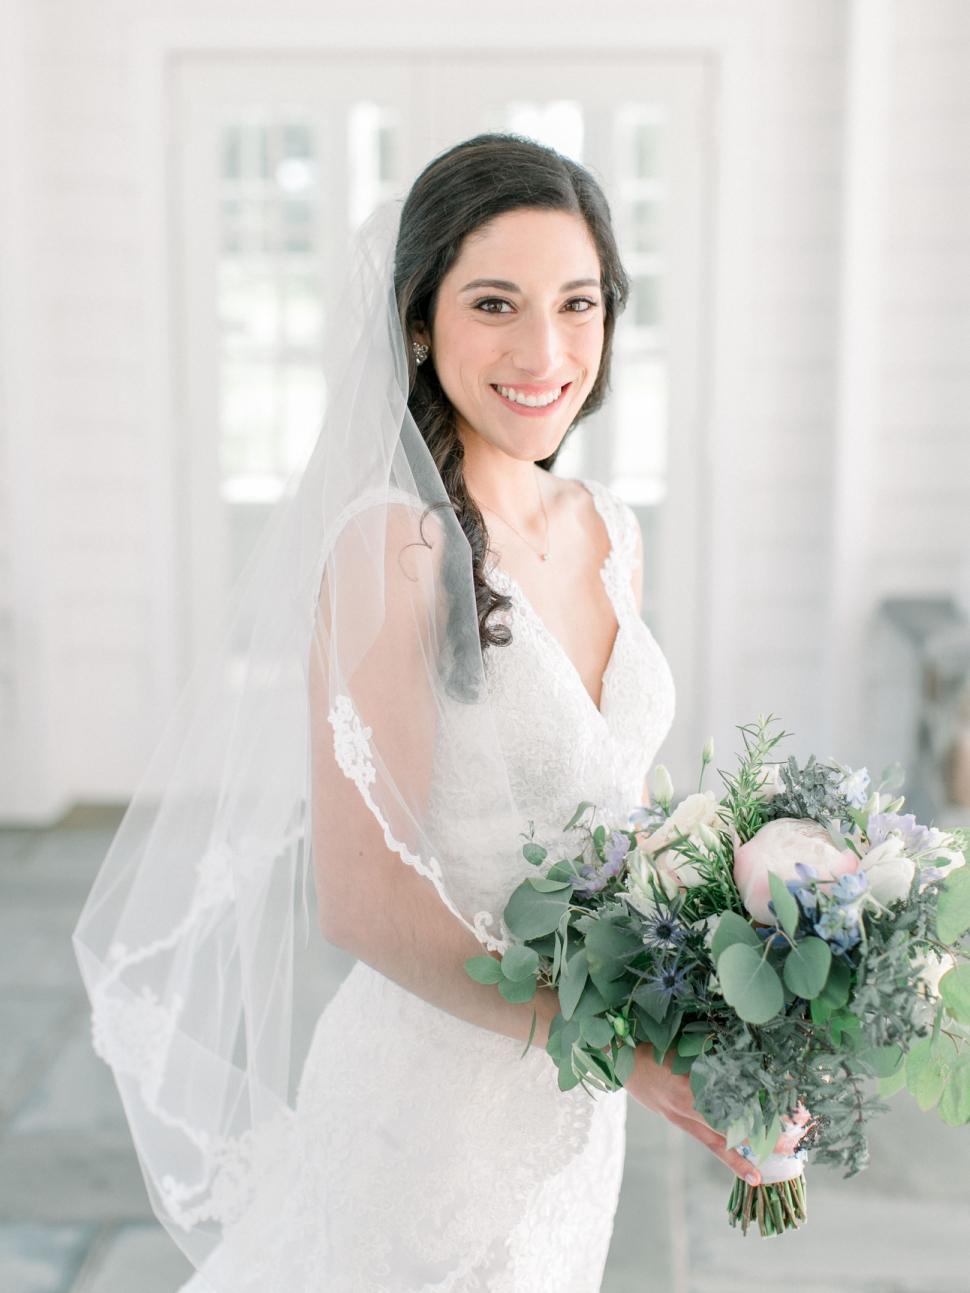 Ryland-Inn-Wedding-Photographer-Cassi-Claire_Ryland-Inn-Wedding_23.jpg